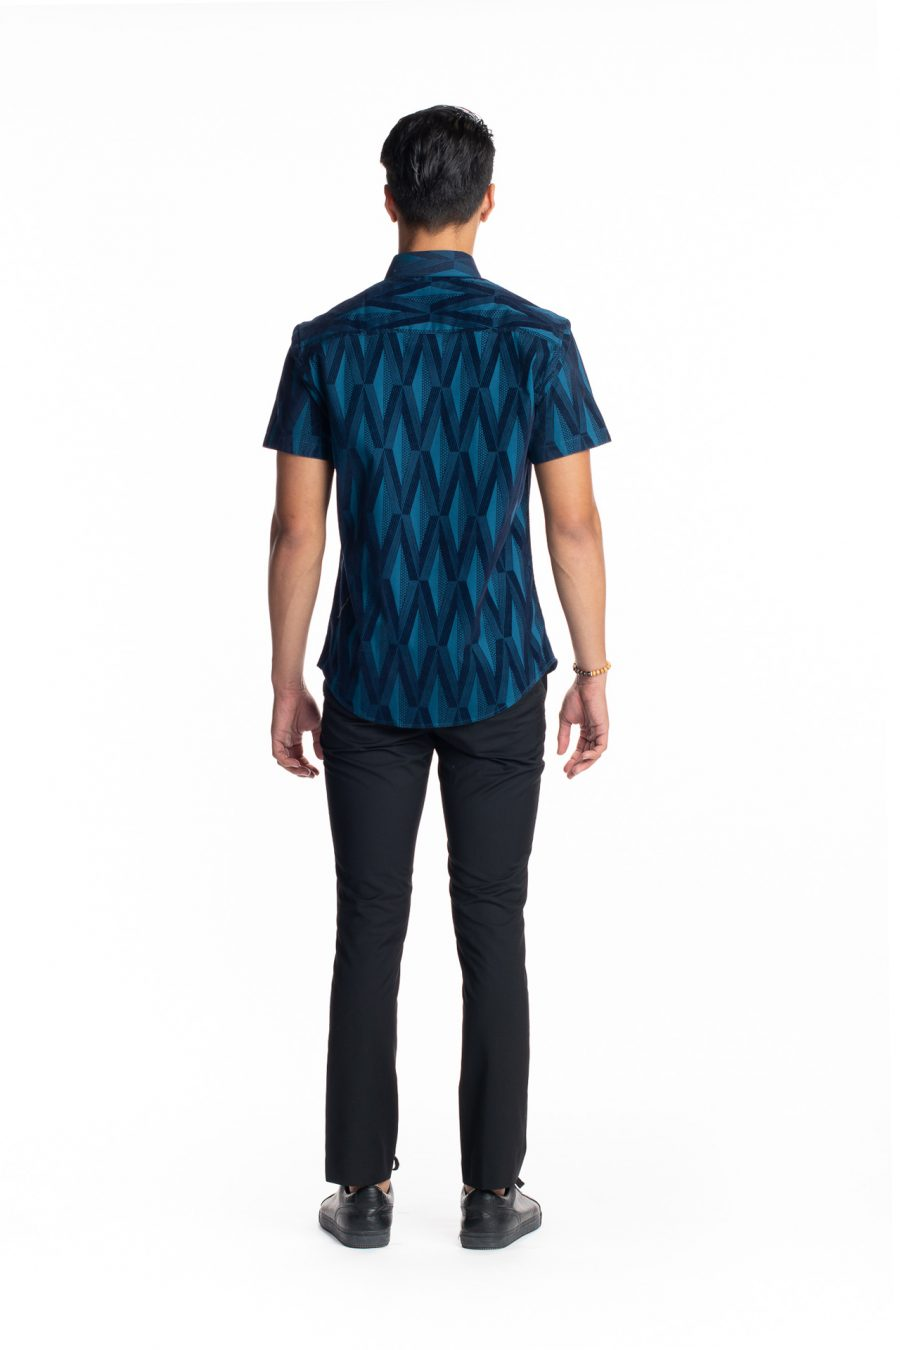 Male Model wearing Aloha Short Sleeve in Teal Kanaloa - Back View